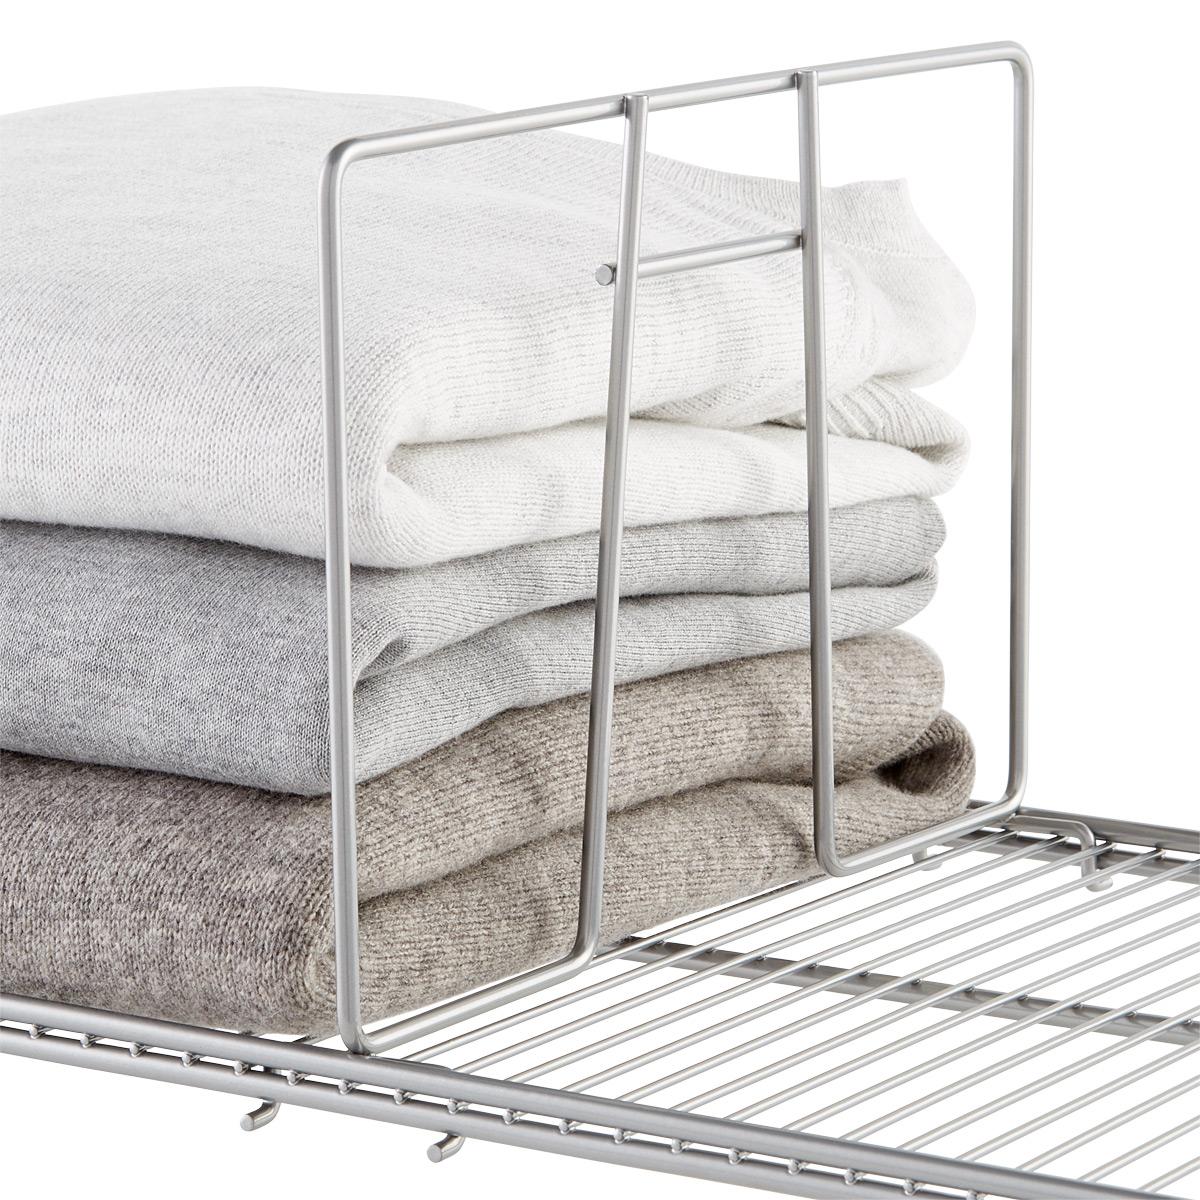 Platinum Elfa Ventilated Wire Shelf Dividers